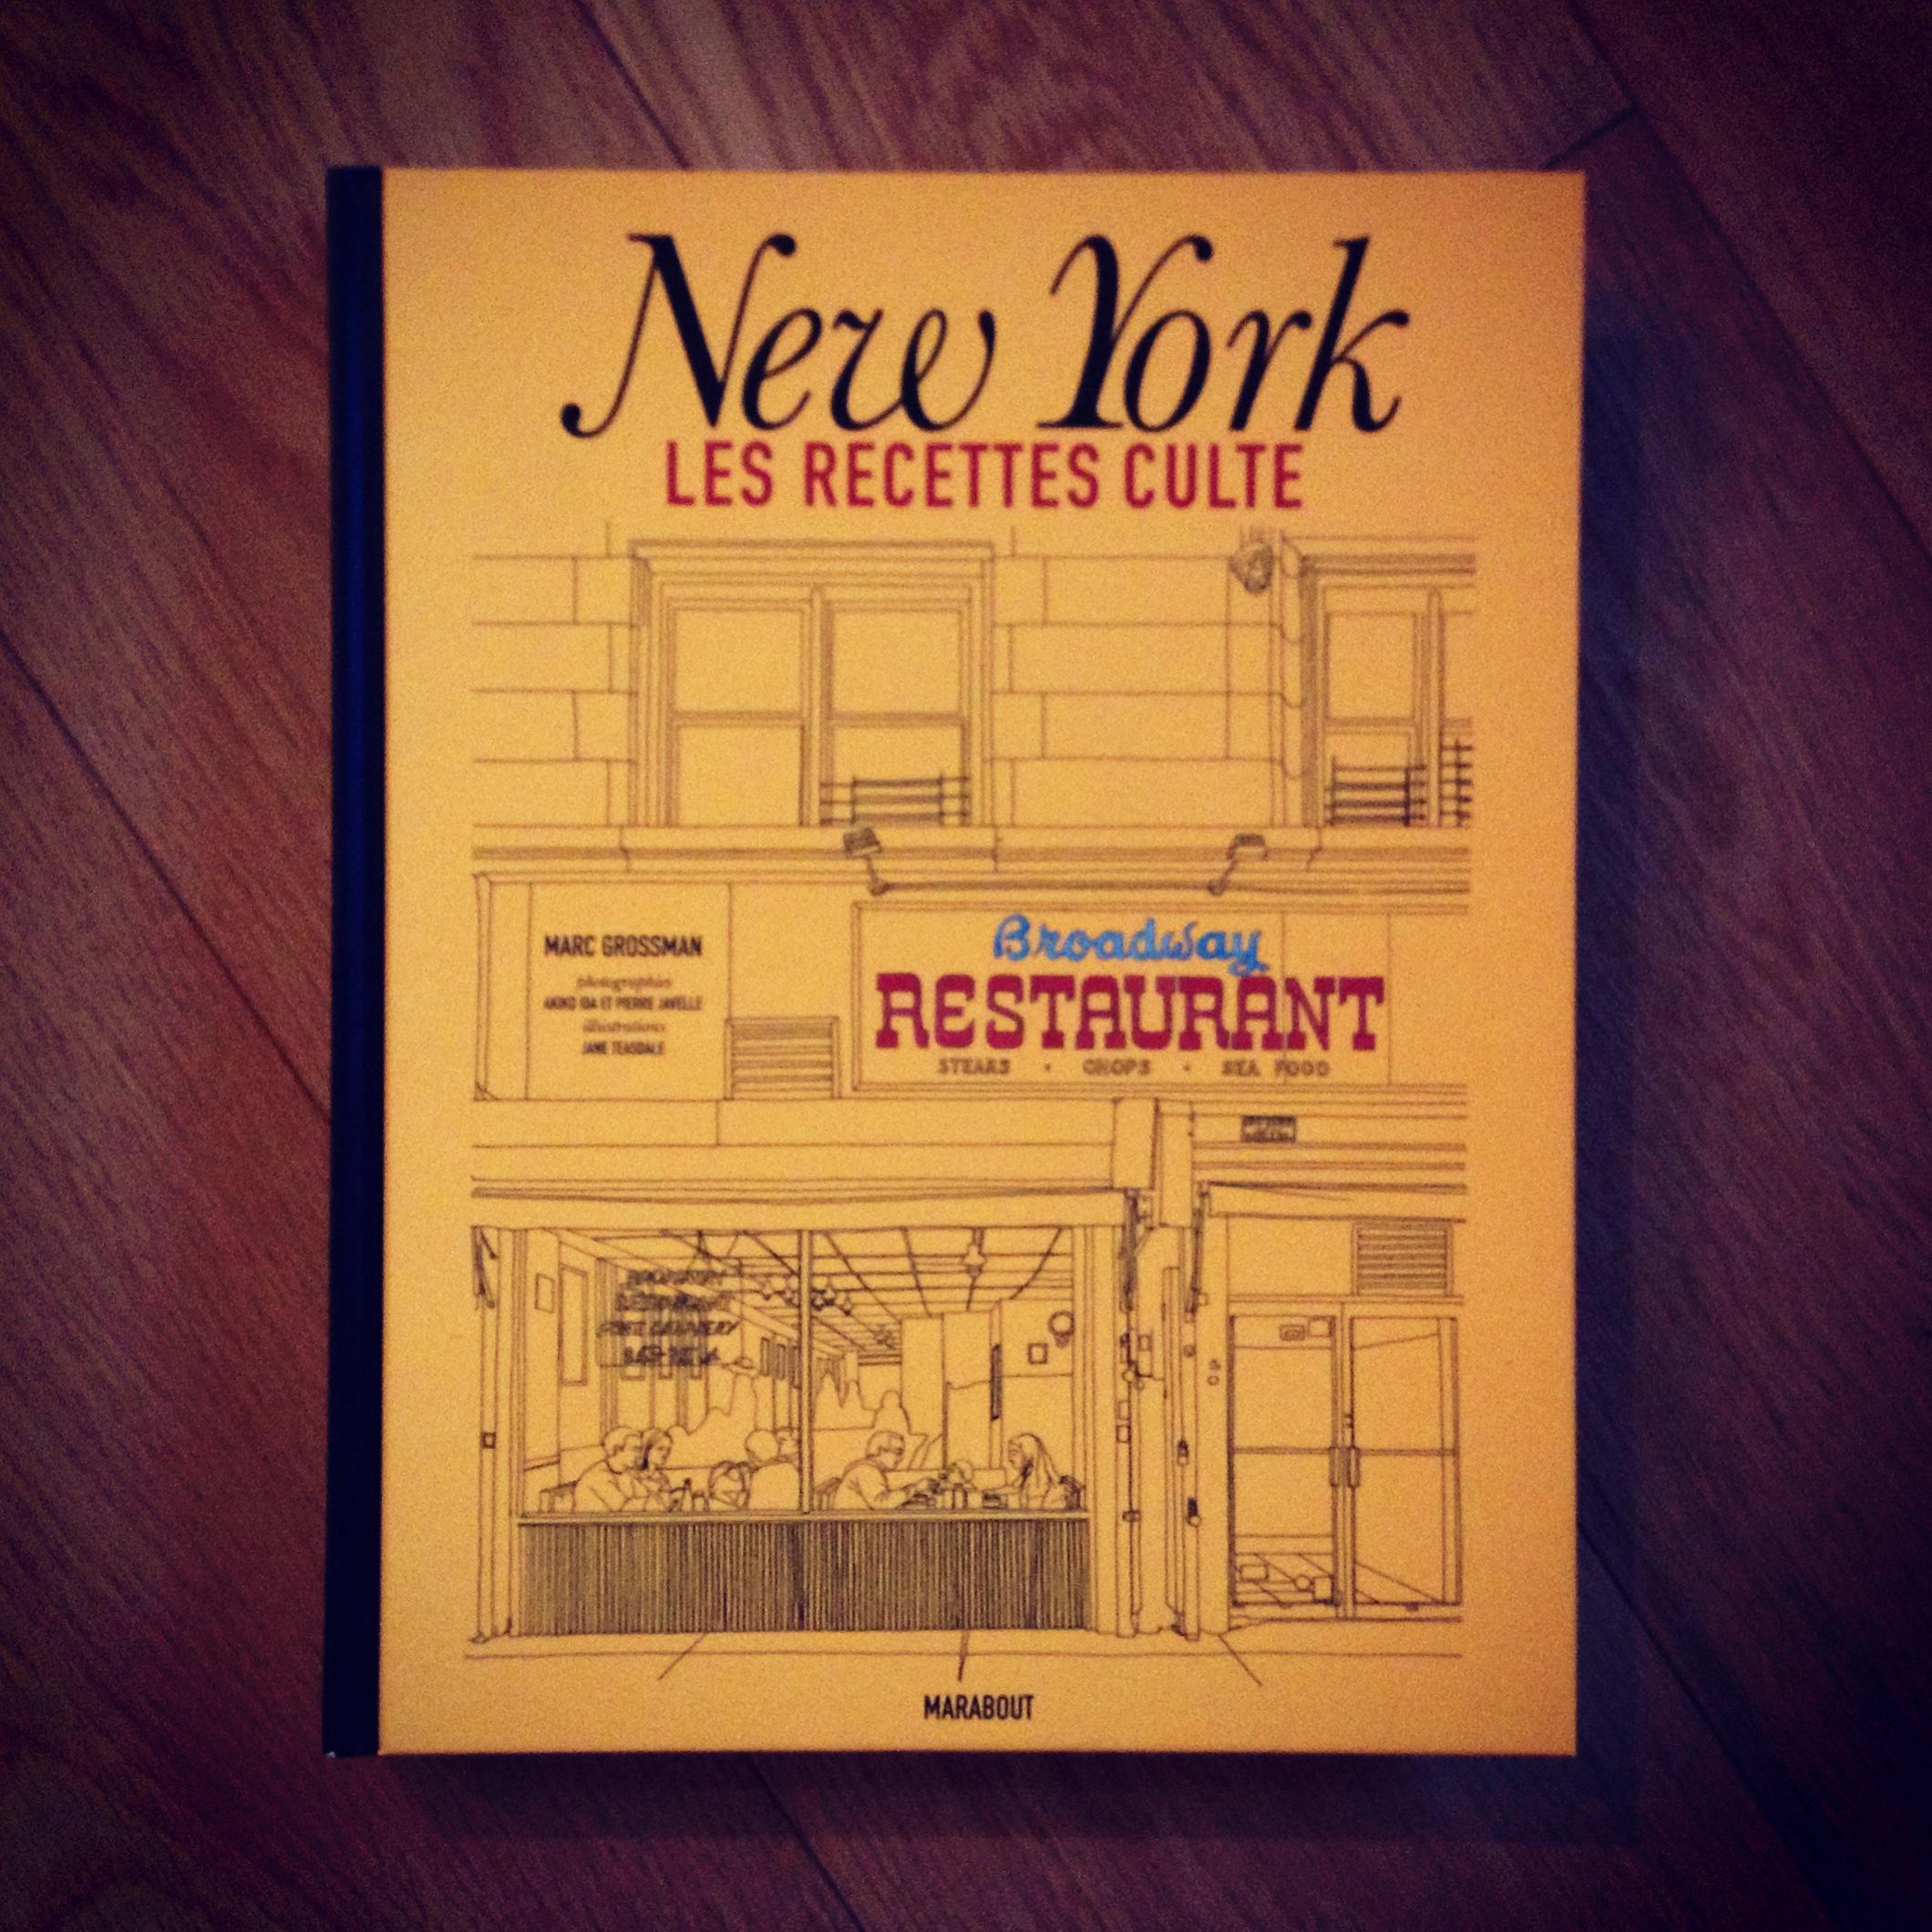 New york les recettes cultes de marc grossman notre avis - Avis new york ...